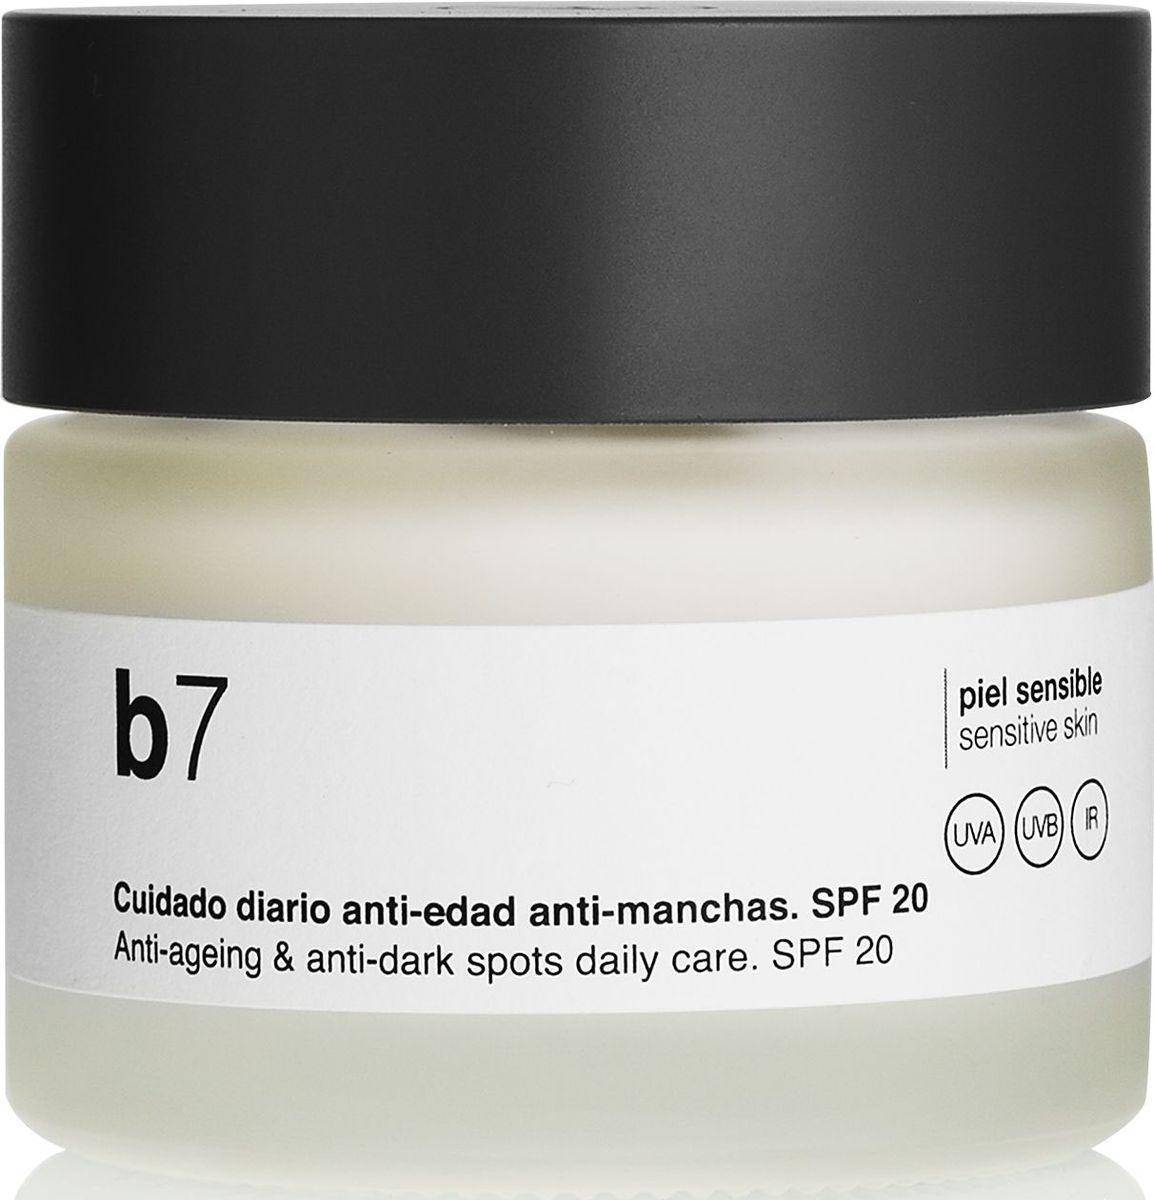 Bella Aurora Антивозрастной крем для лица выравнивающий тон кожи SPF 20, 50 мл - Косметика по уходу за кожей